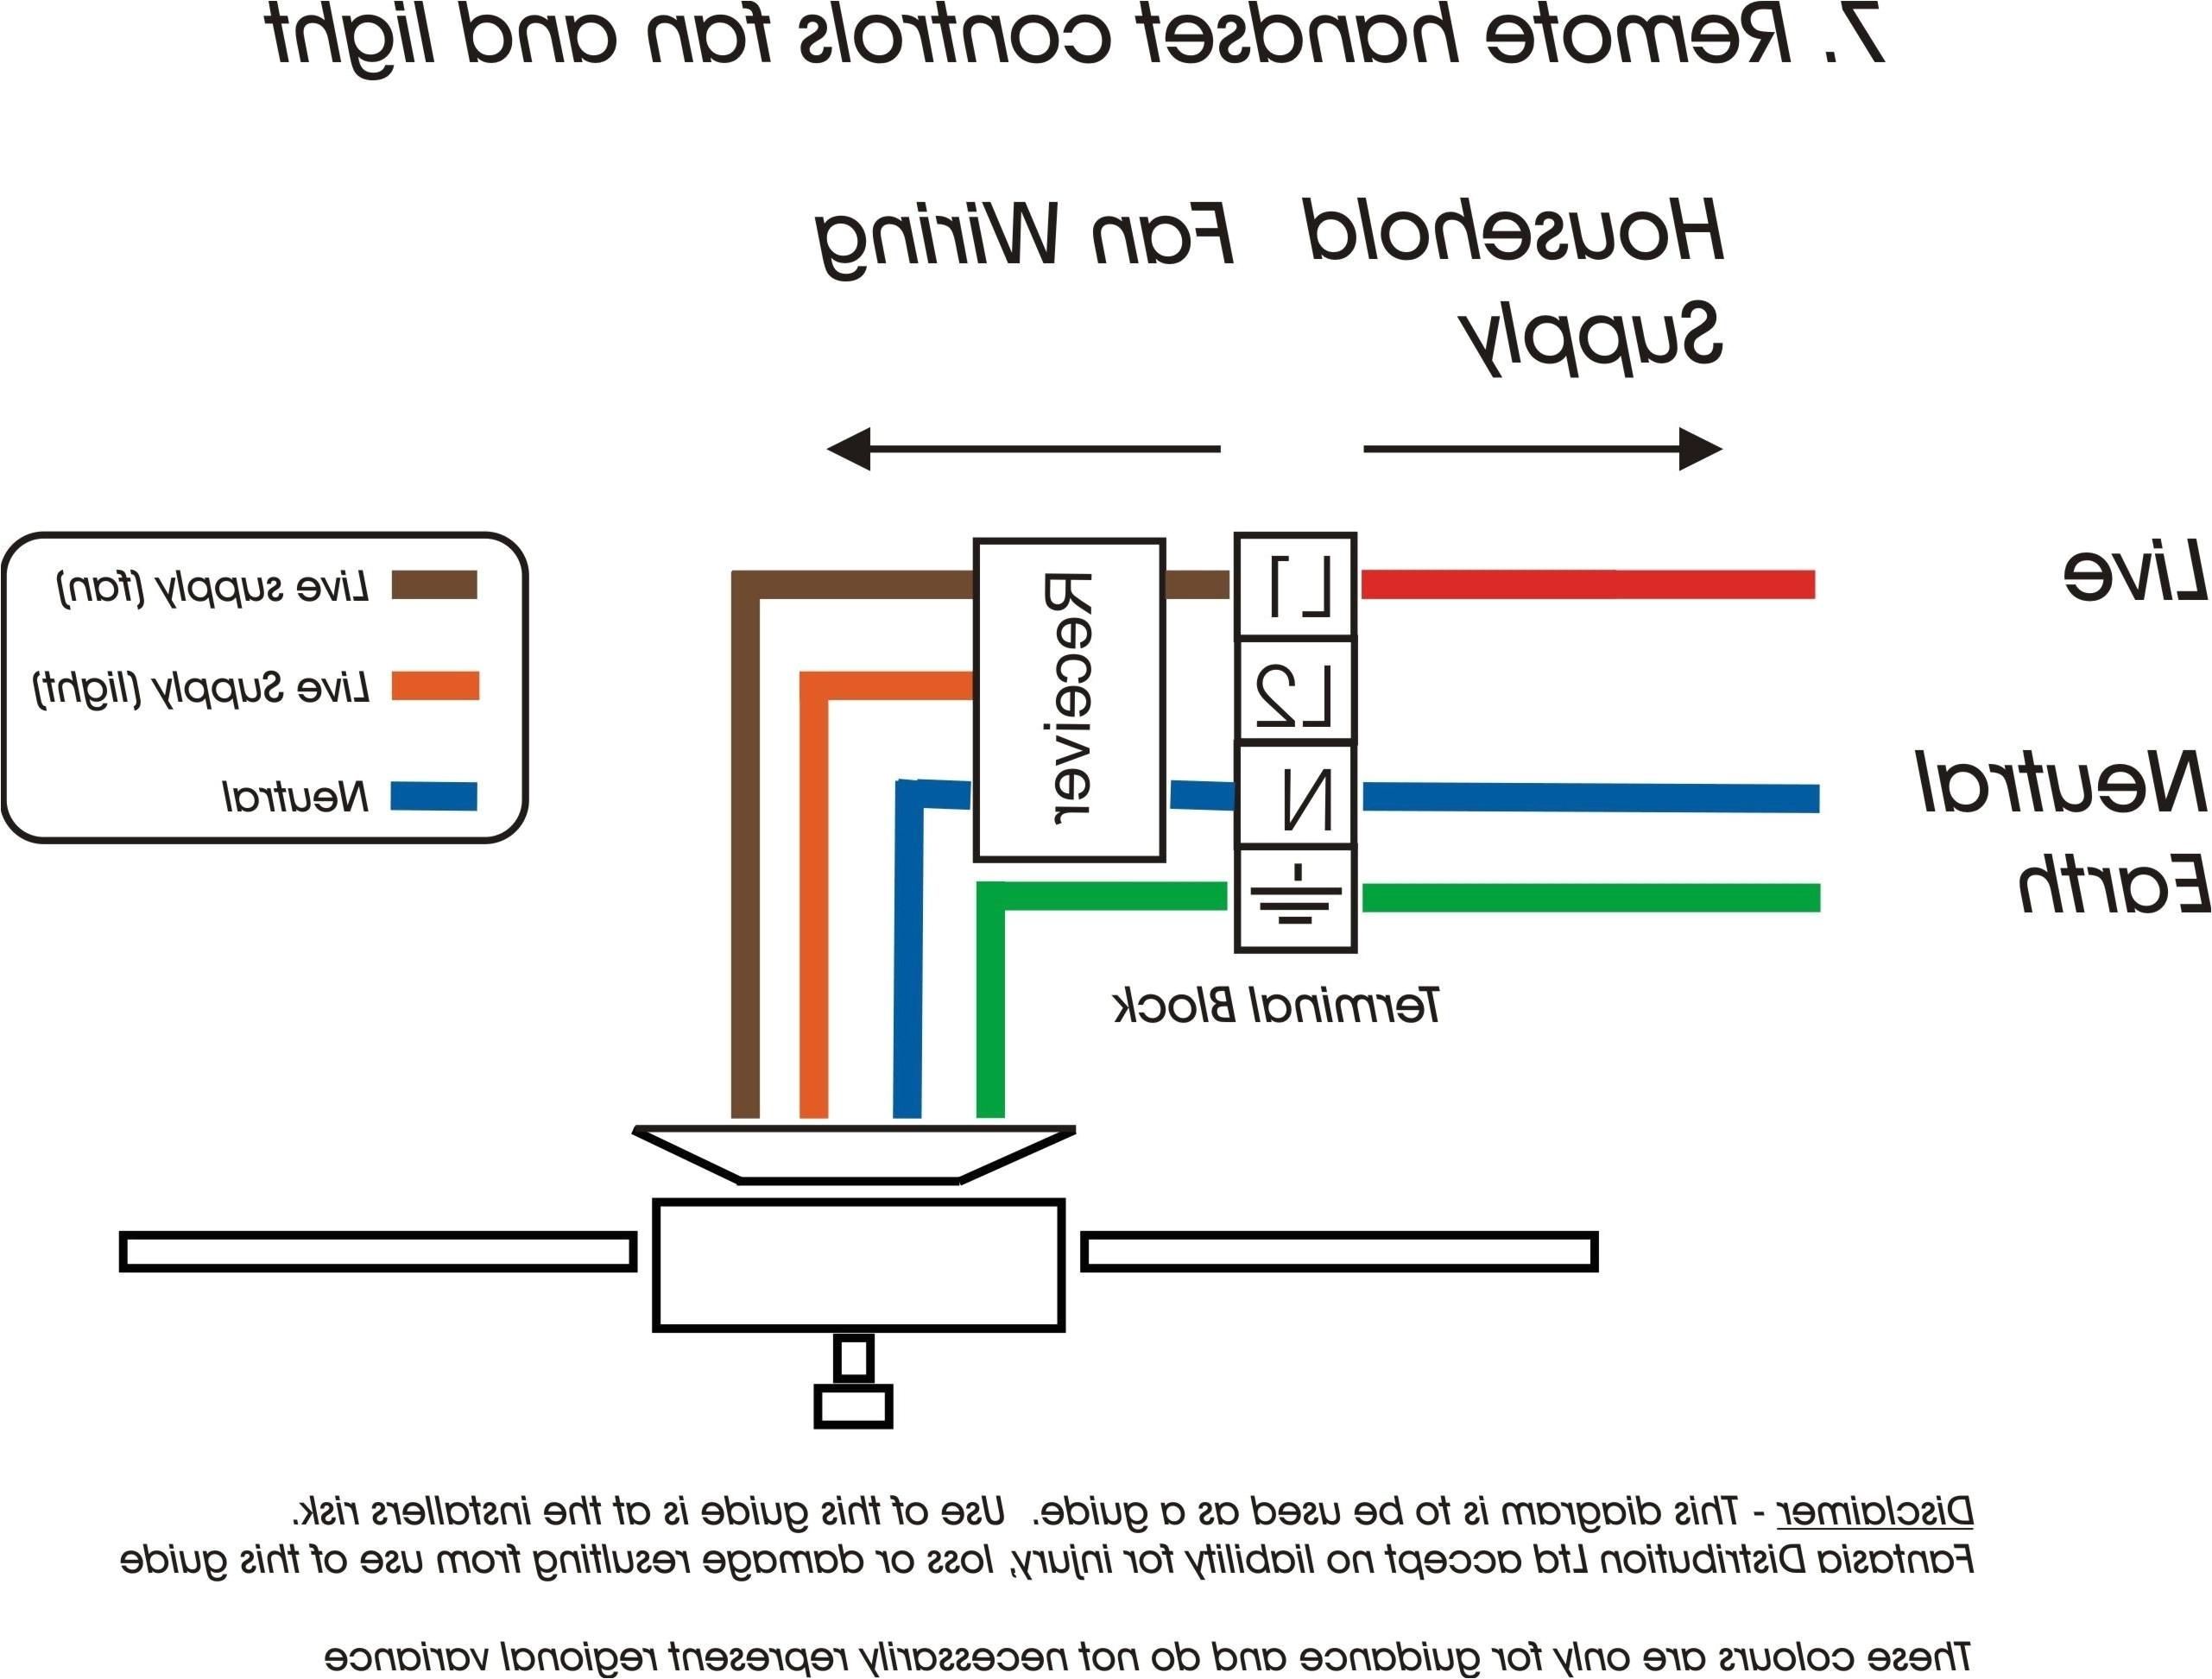 teejet 744a 3 wiring diagram low voltage lighting wiring diagram collection wiring diagram outdoor ac